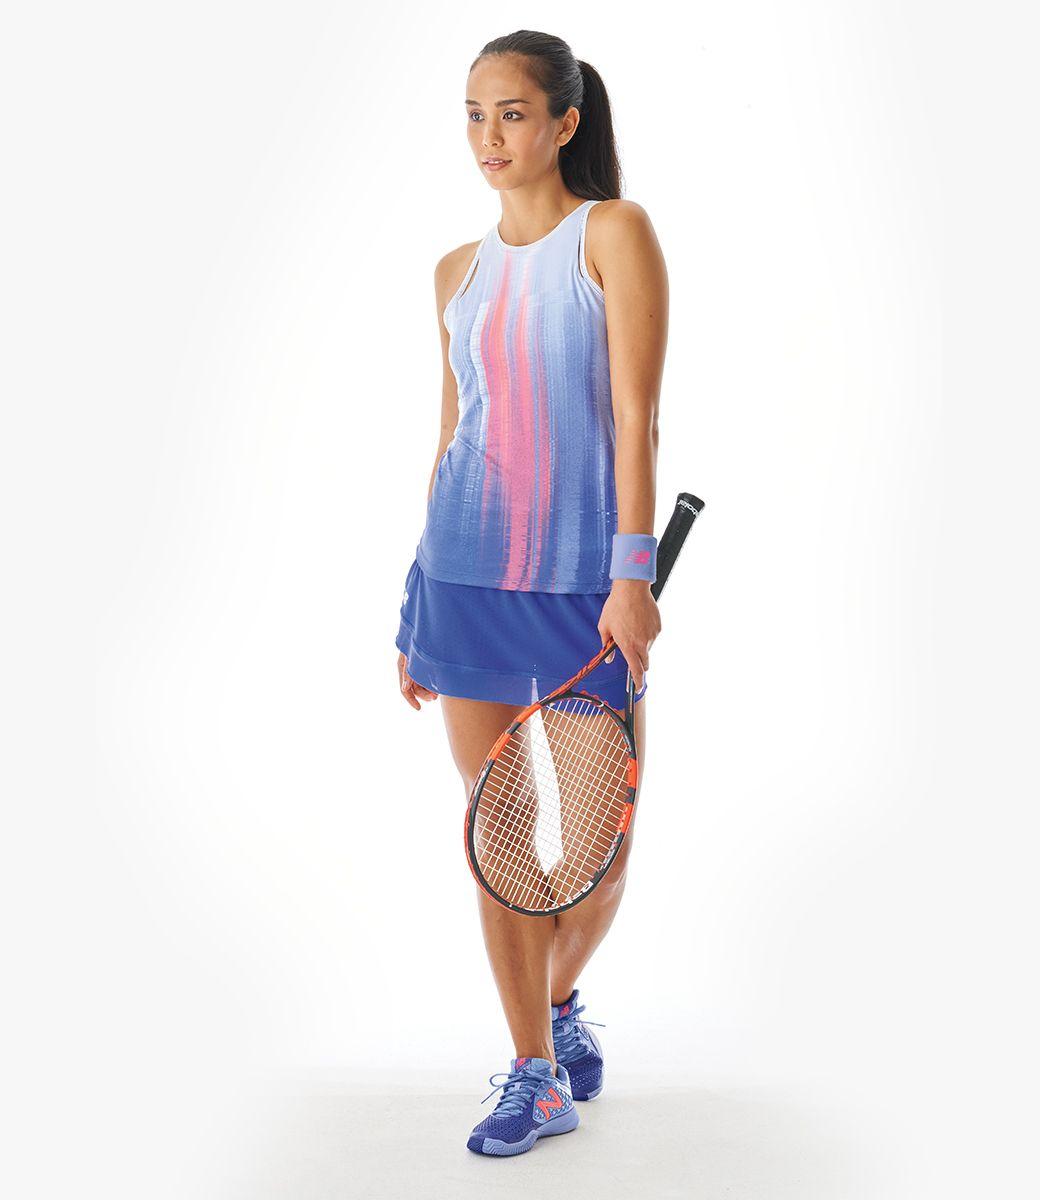 New Balance Womens NYC Tennis Style,